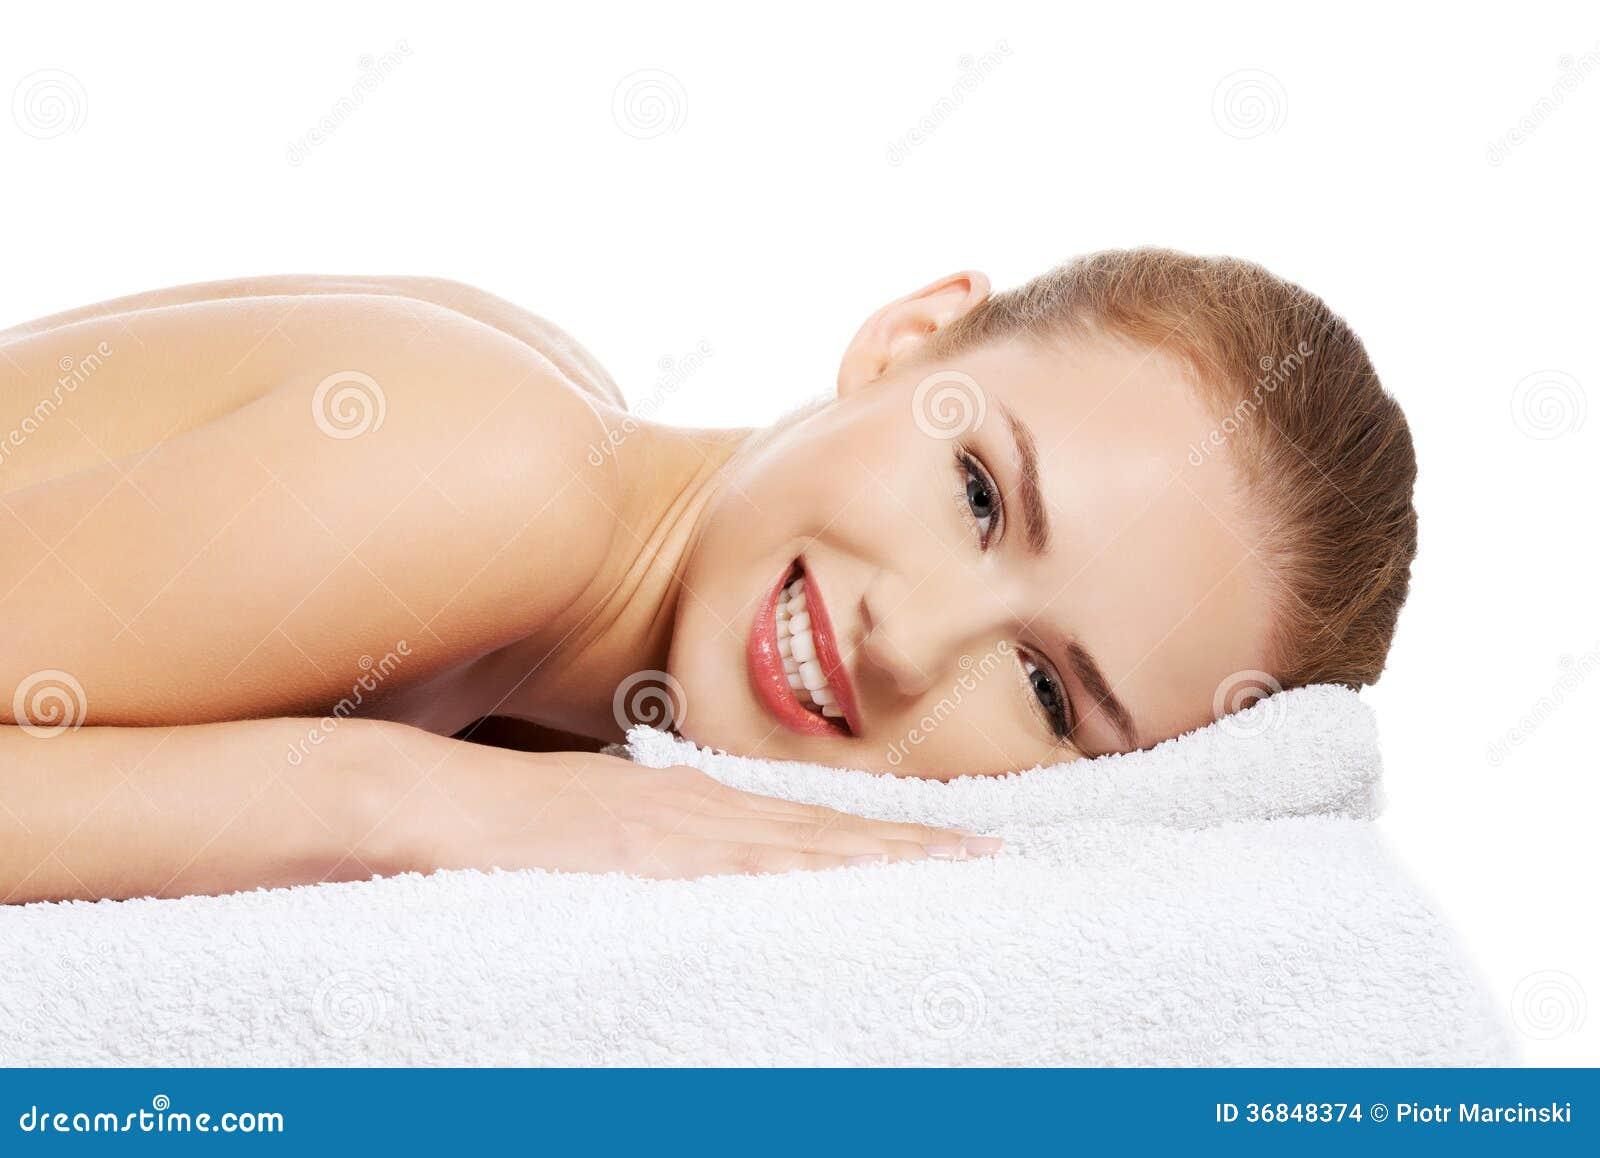 Piękny caucasian nagi kobiety lying on the beach na masażu rel i stole